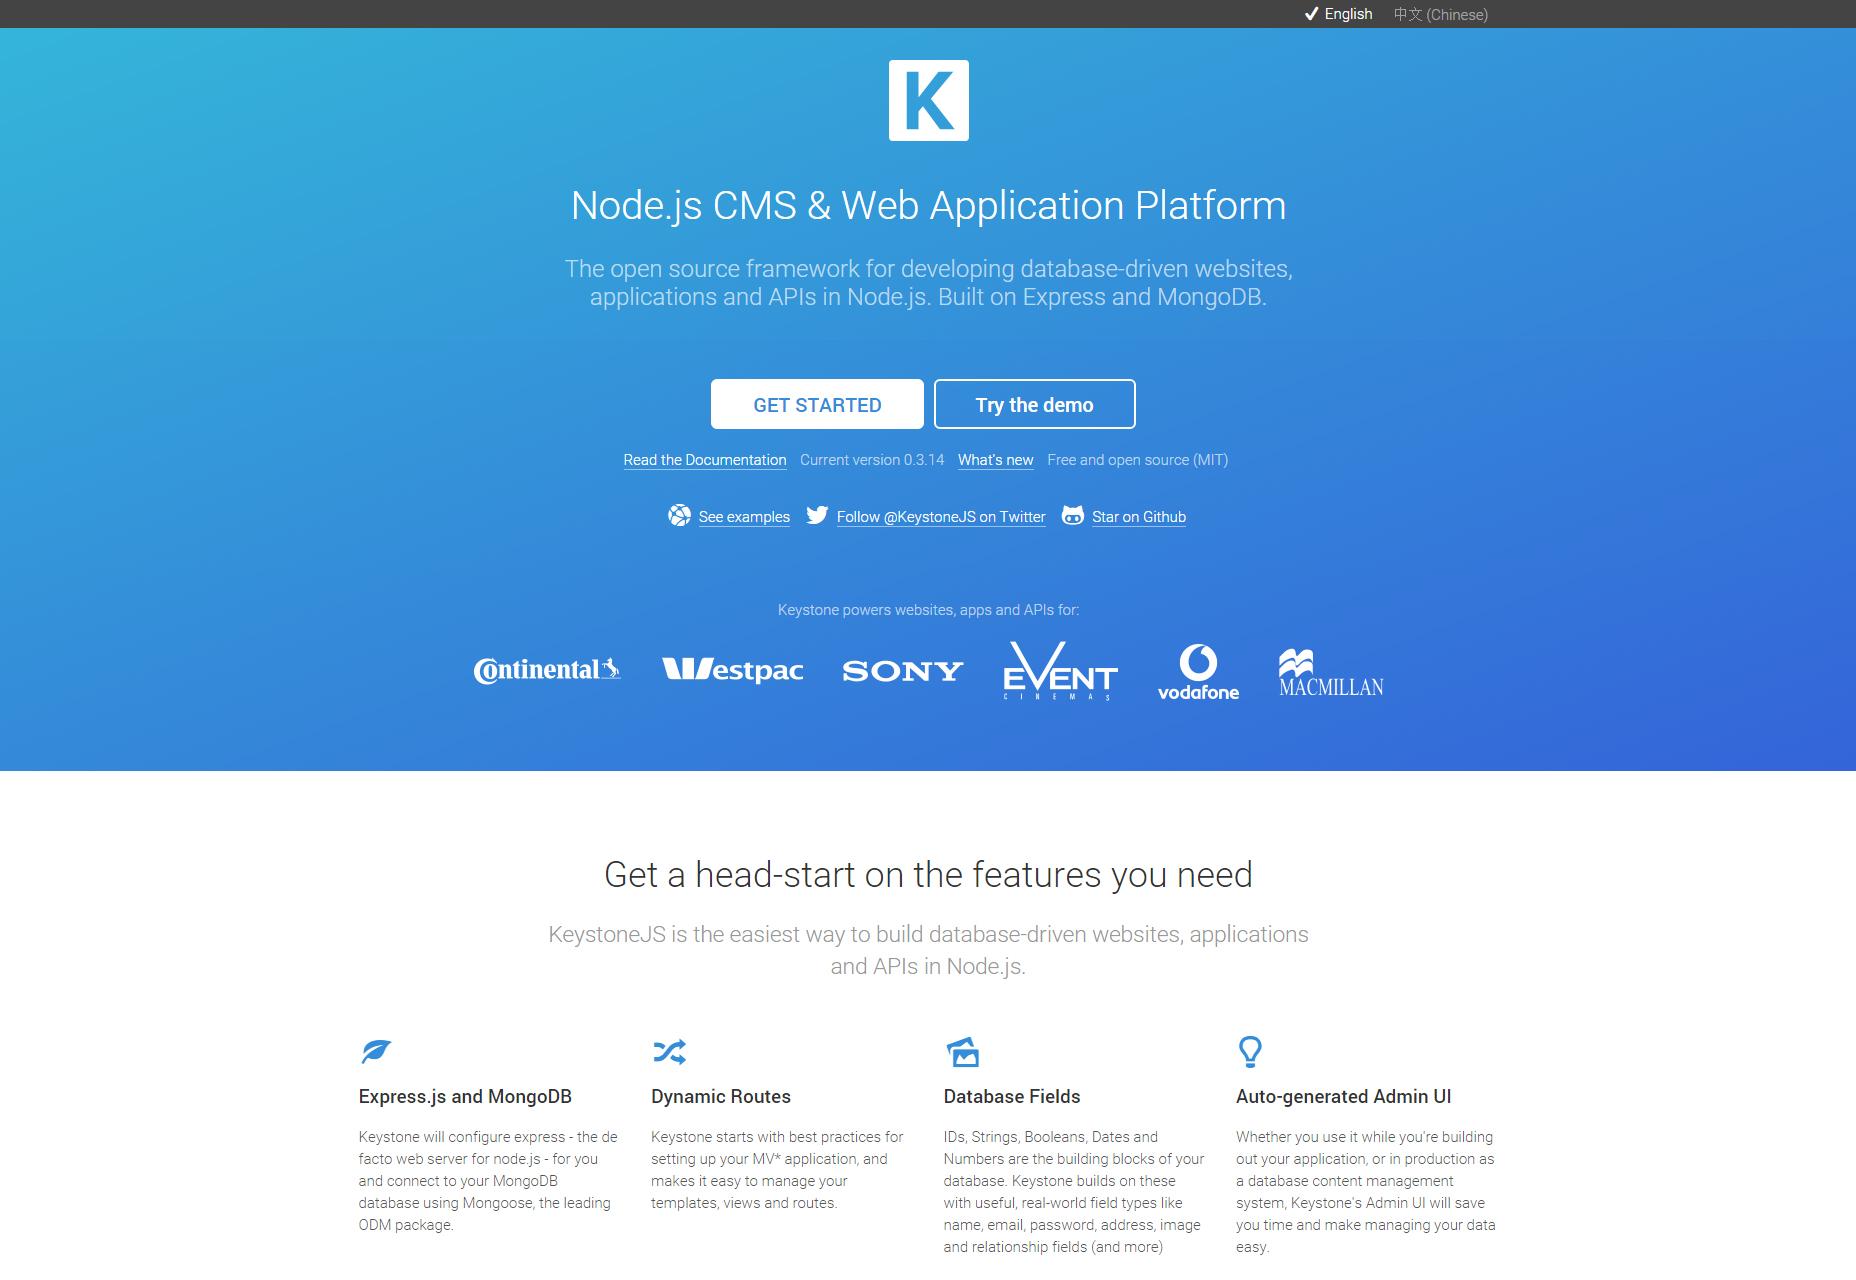 KeystoneJS: Node.js CMS y plataforma de aplicaciones web